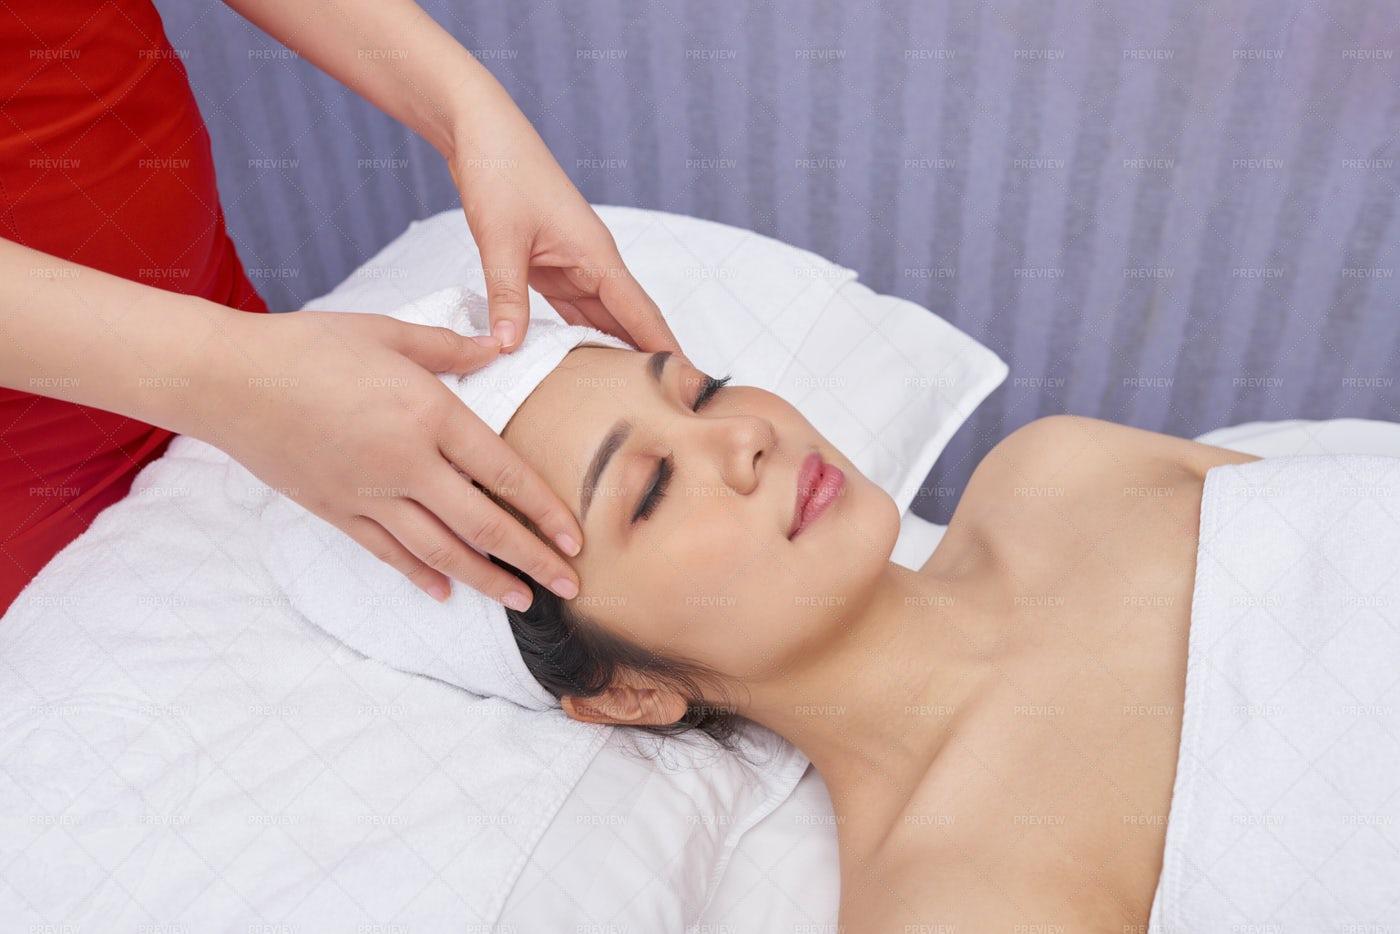 Face Massage At Beauty Salon: Stock Photos